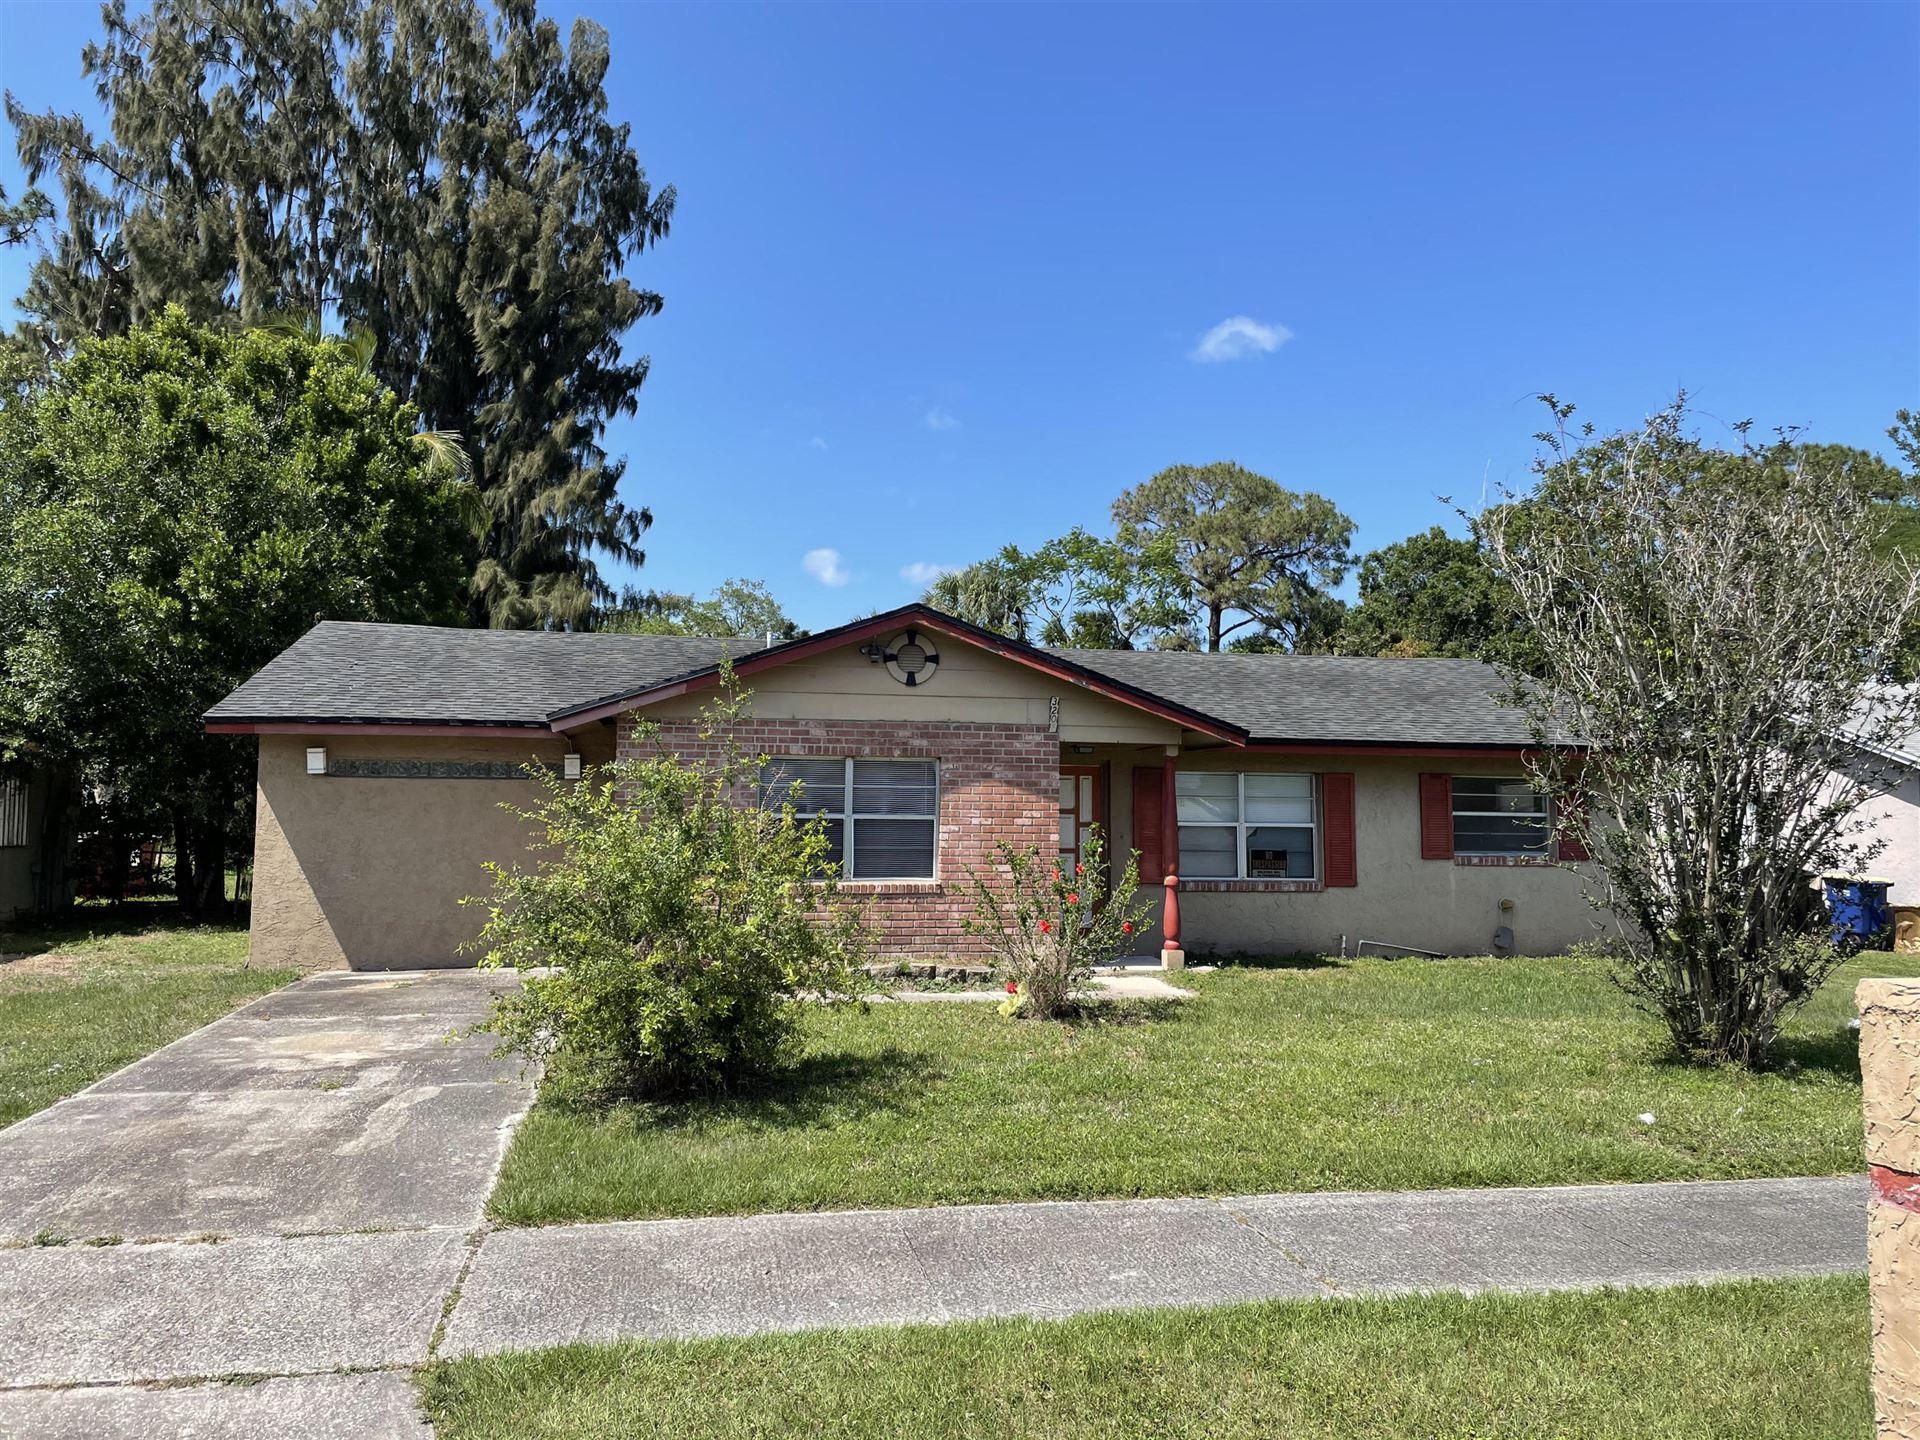 3208 Hibiscus Avenue, Fort Pierce, FL 34947 - MLS#: RX-10713485